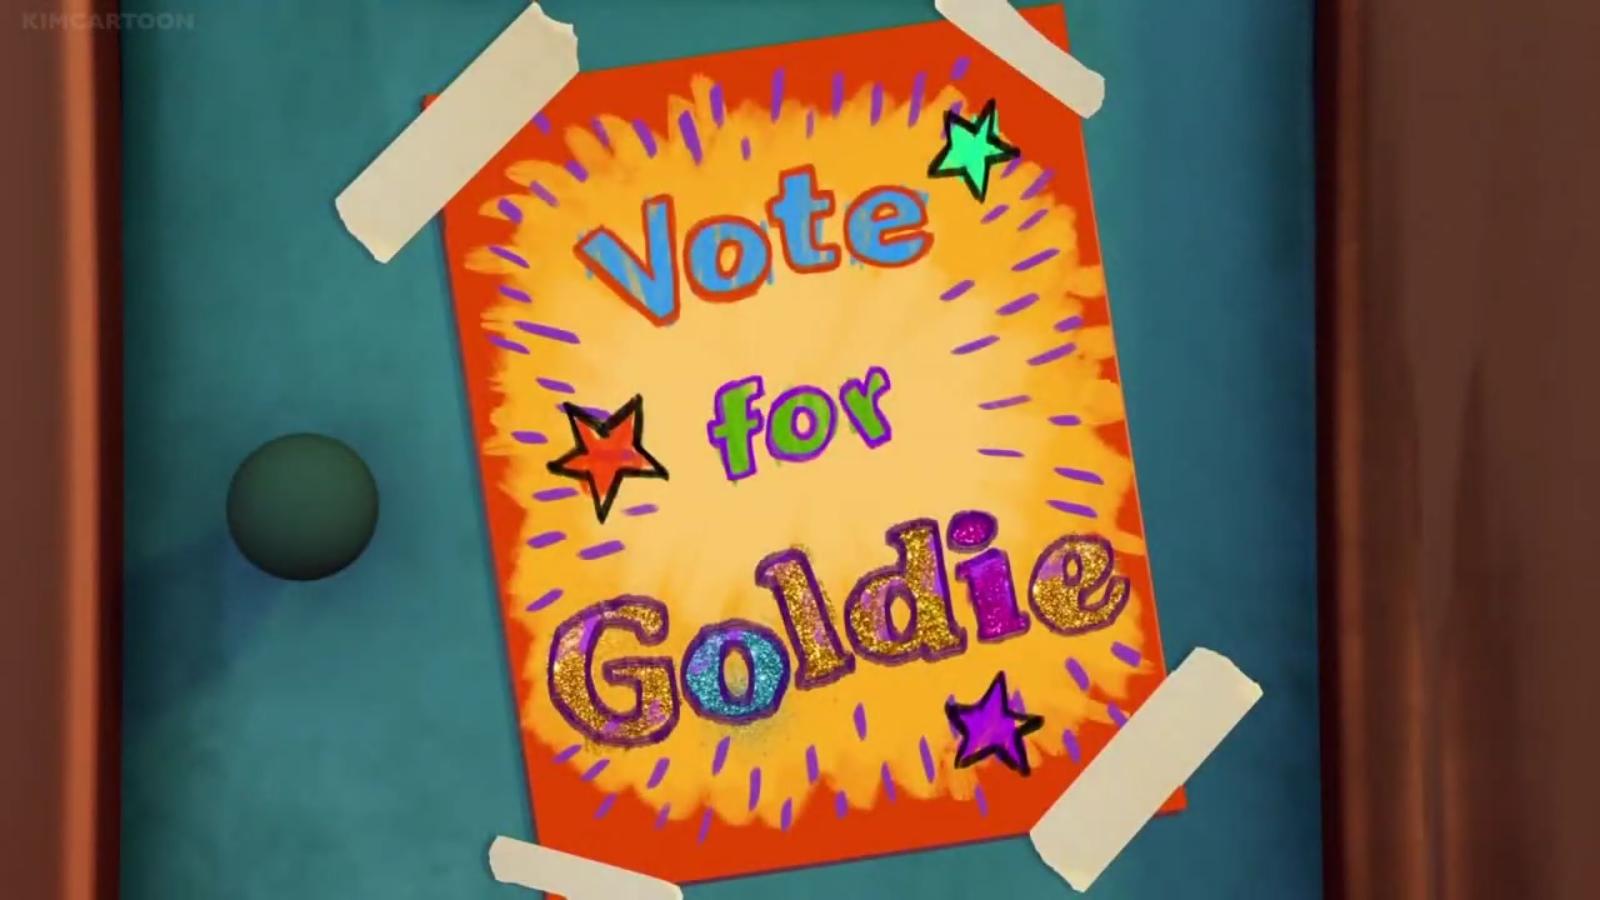 Vote for Goldie!